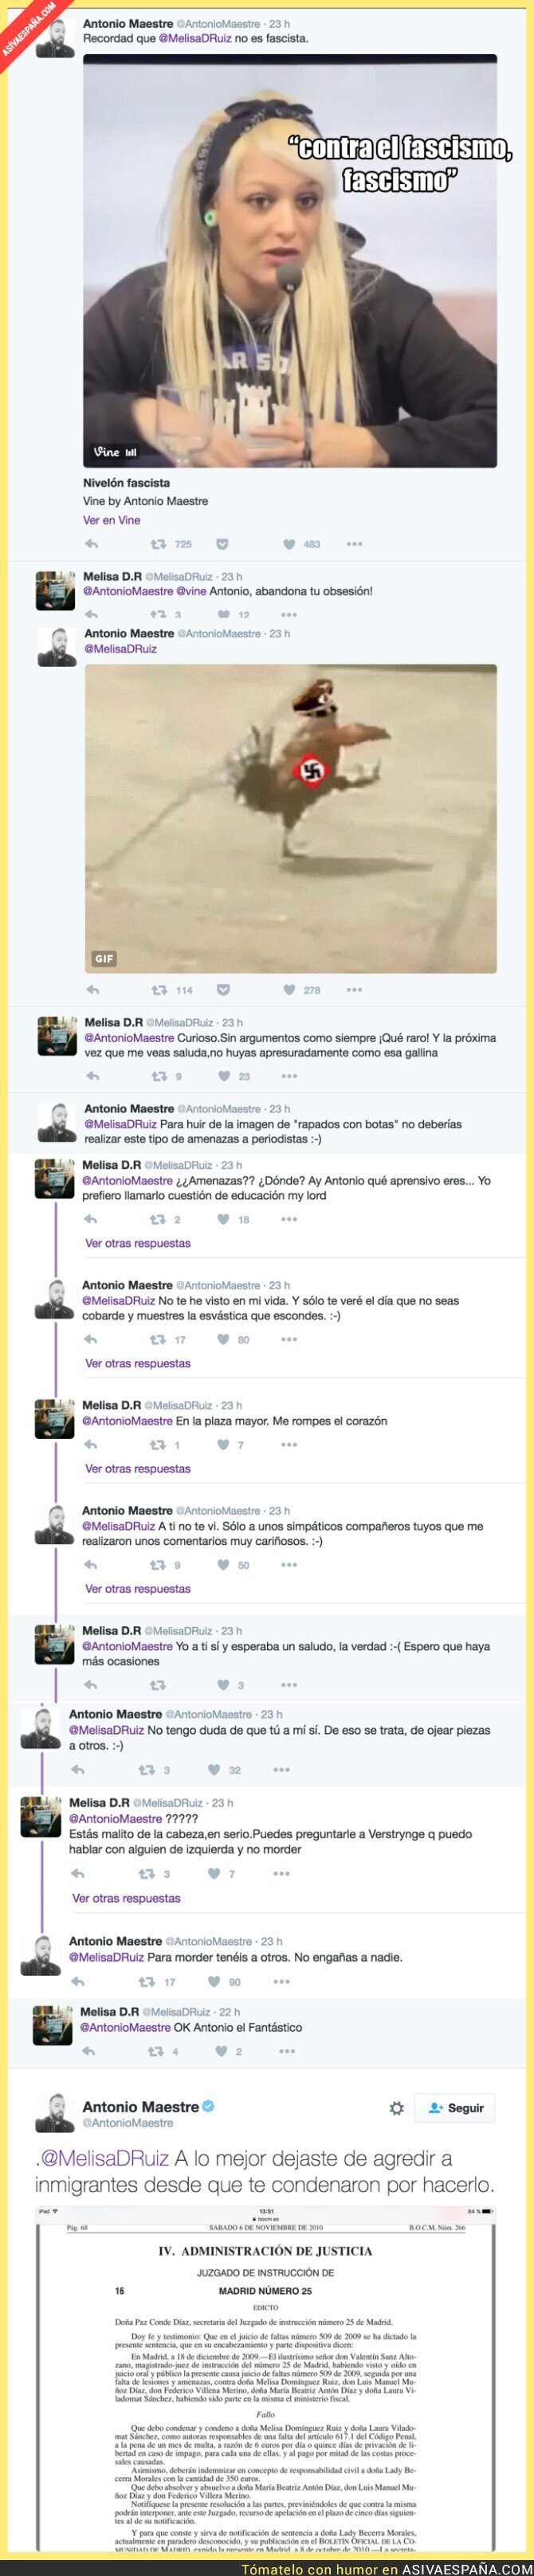 56061 - ZASCA tremendo de Antonio Maestre a la nazi de Hogar Social Madrid que esconde su tatuaje nazi